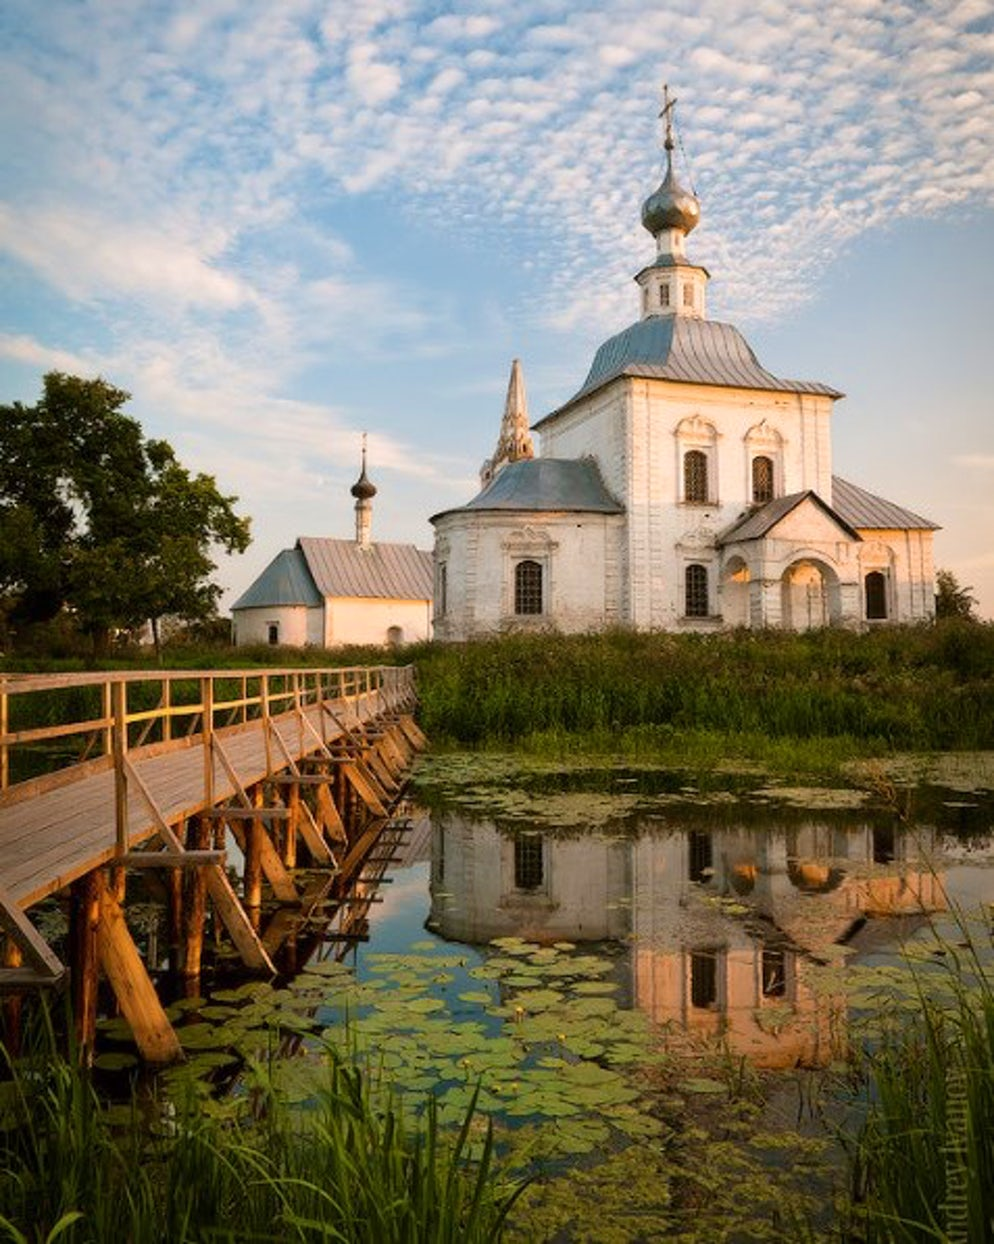 Photo © credits to rosphoto/andrey_ivanov